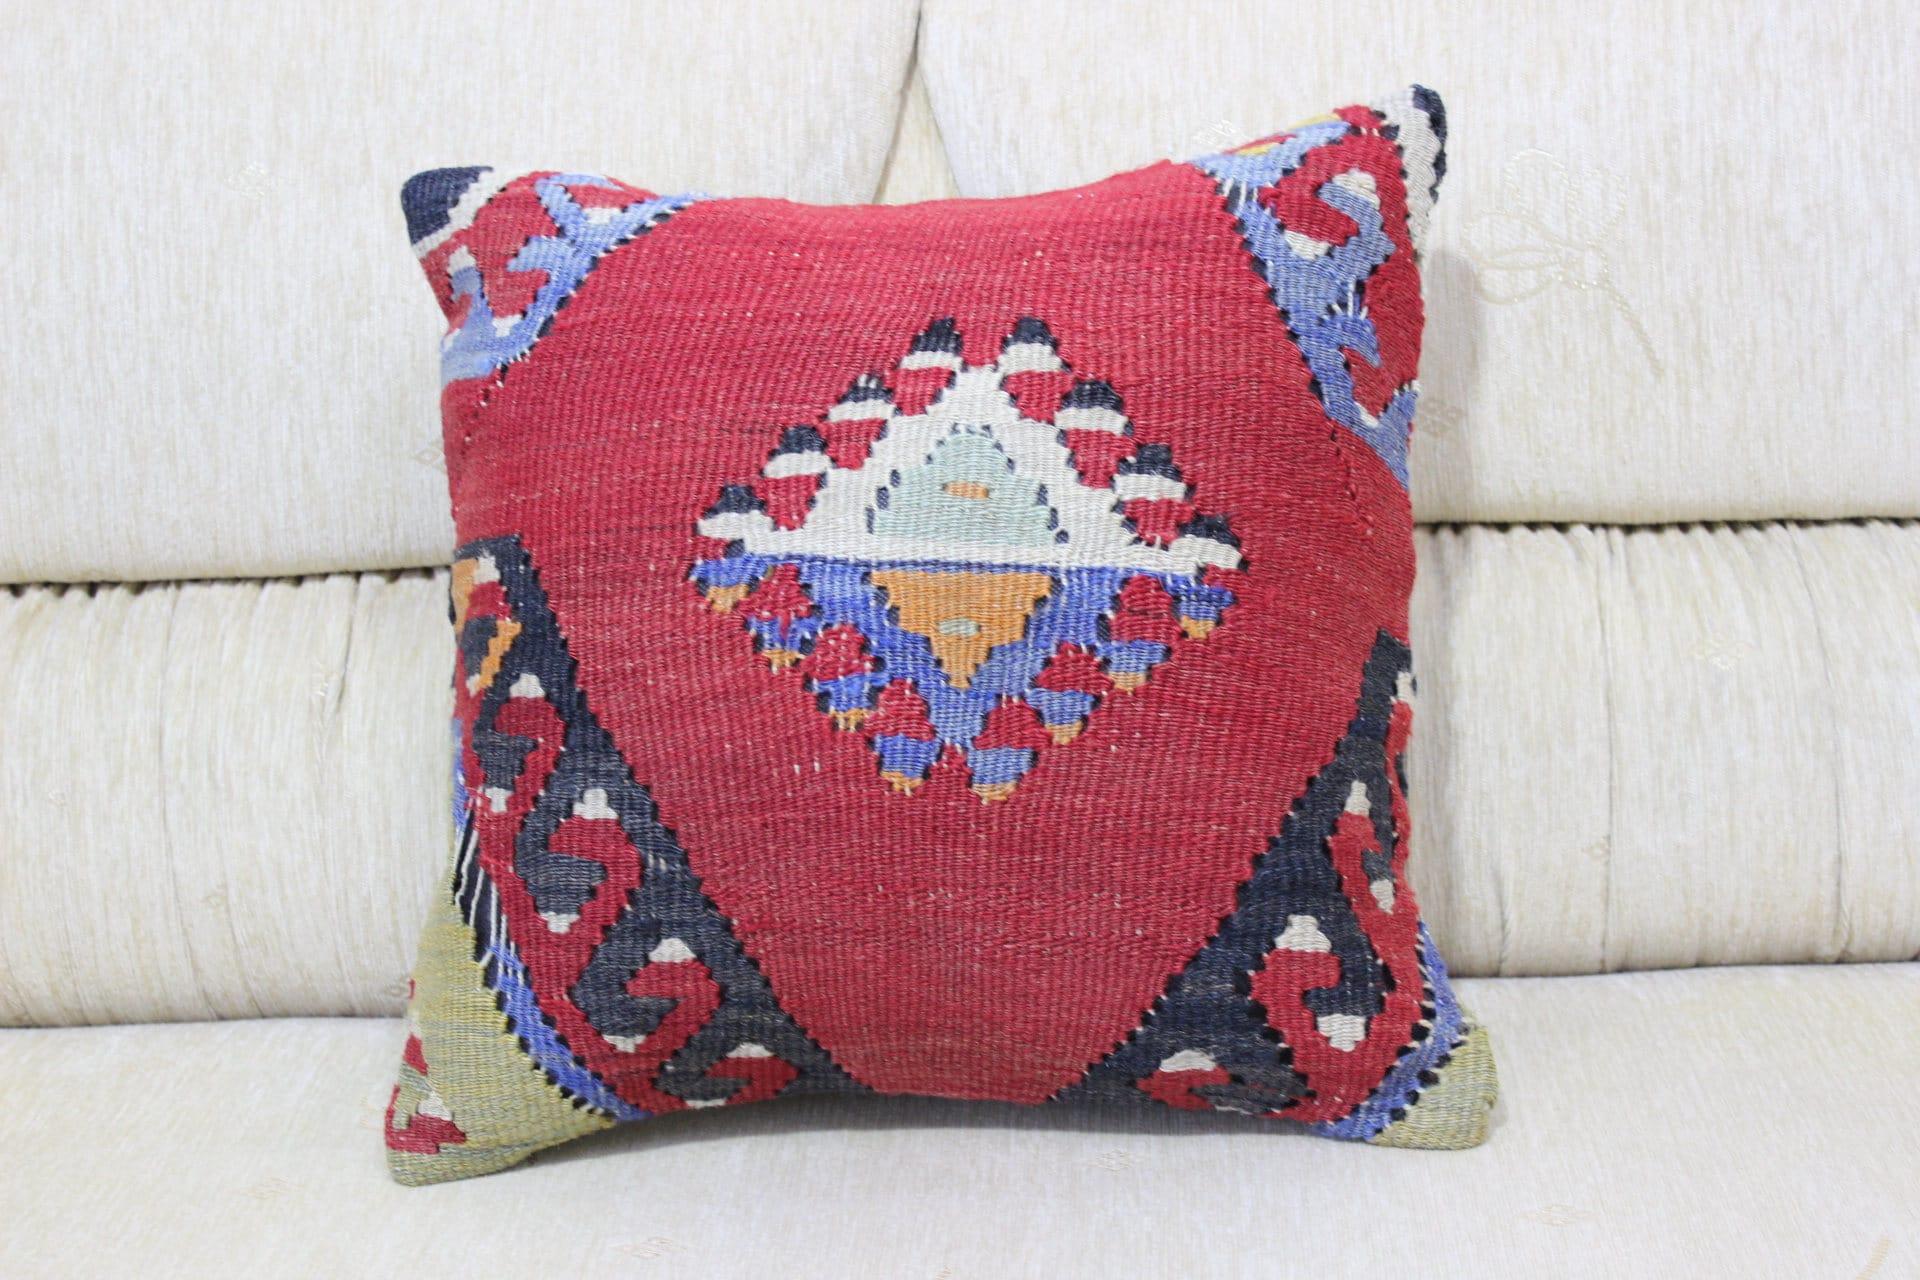 16x16 Kilim Pillow Kelim Cushion Wool Pillow Aztec Pillow Boho Decor Home  Decor Pillow Anatolian Pillow